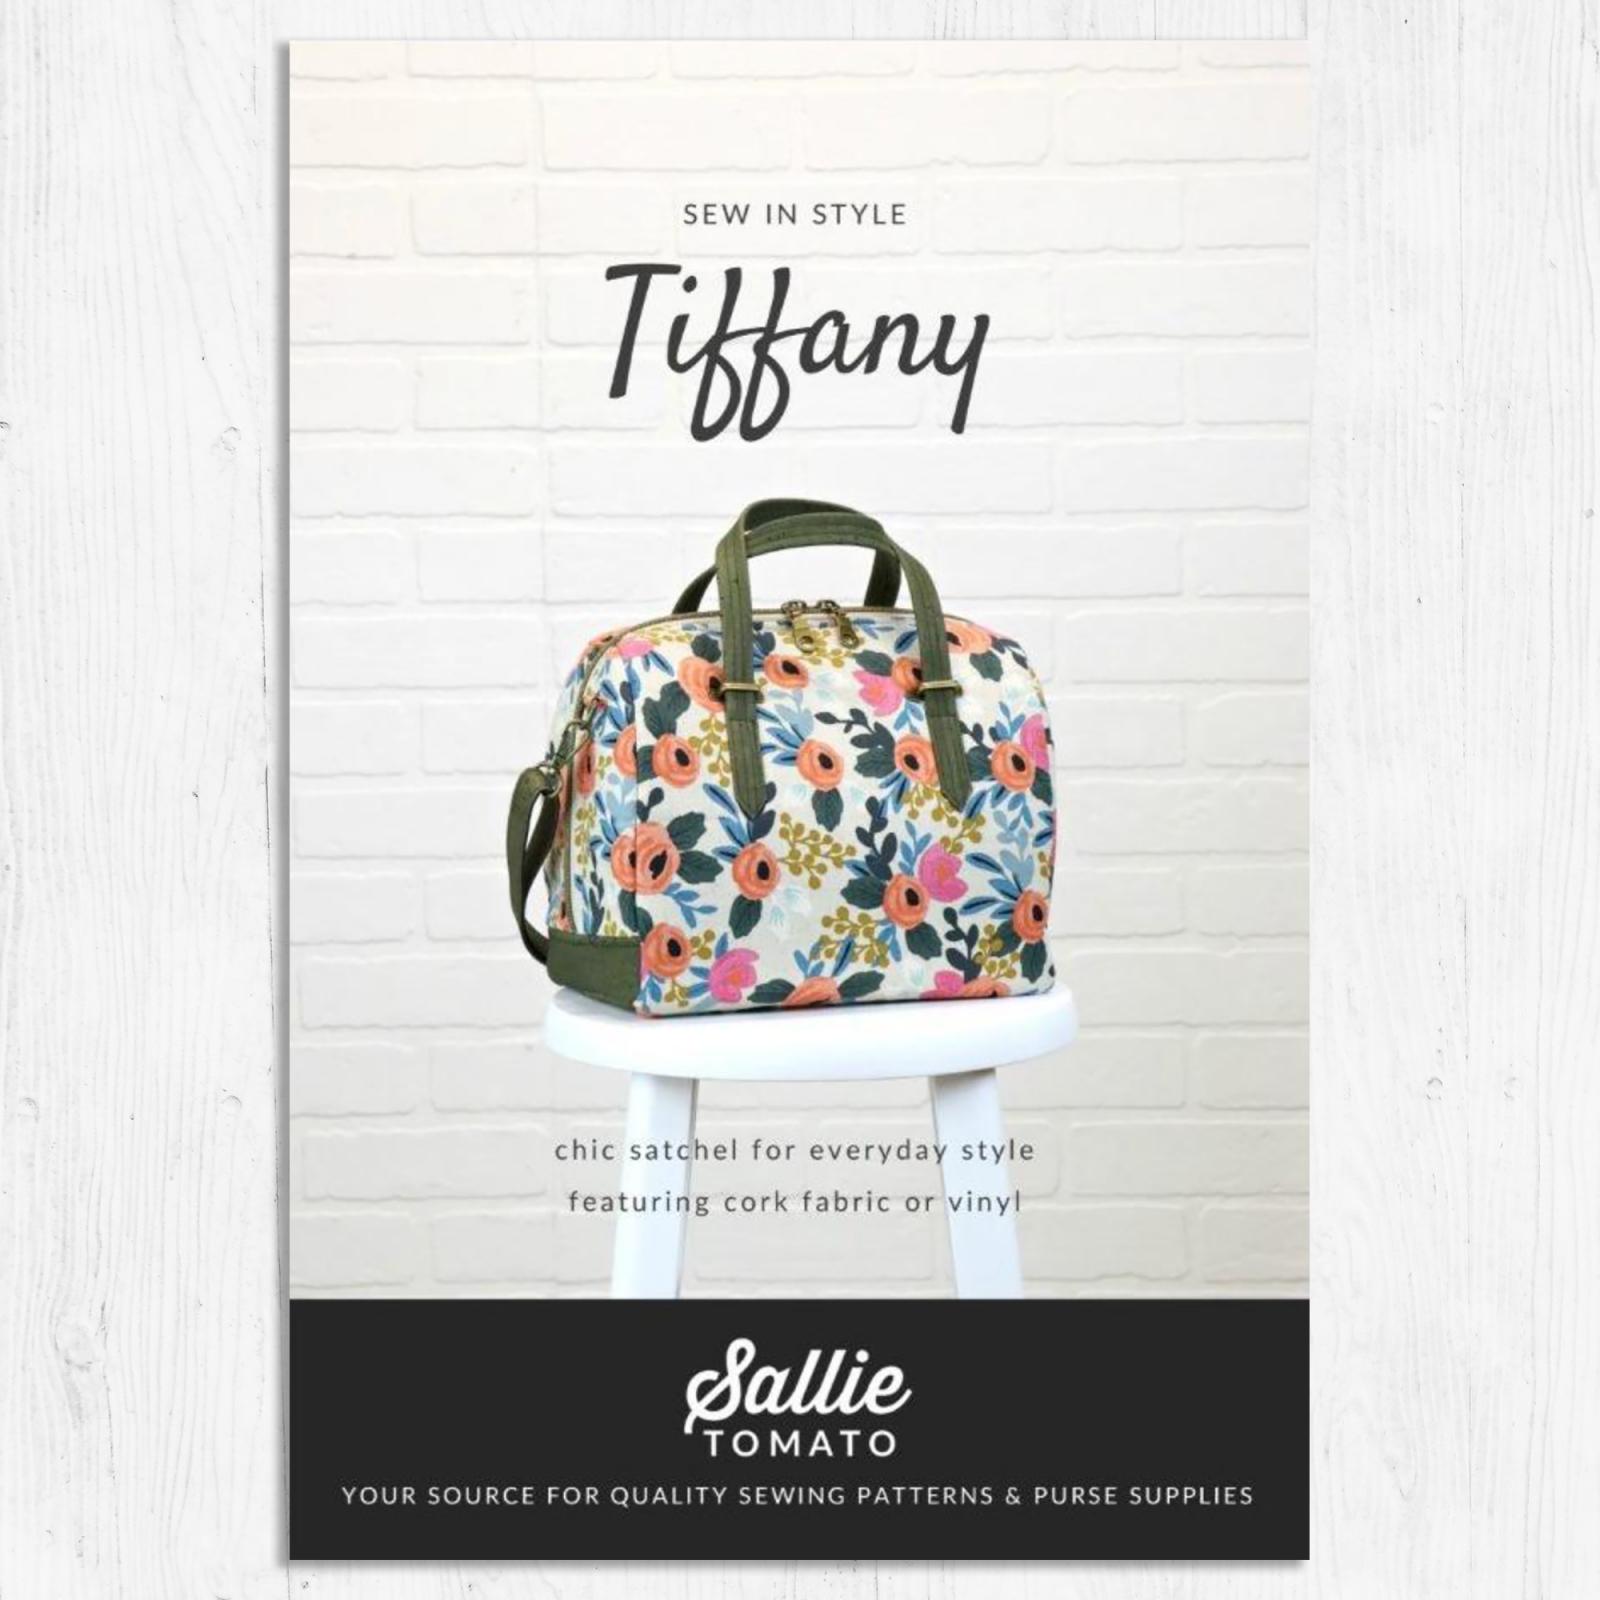 Sallie Tomato - Tiffany Bag